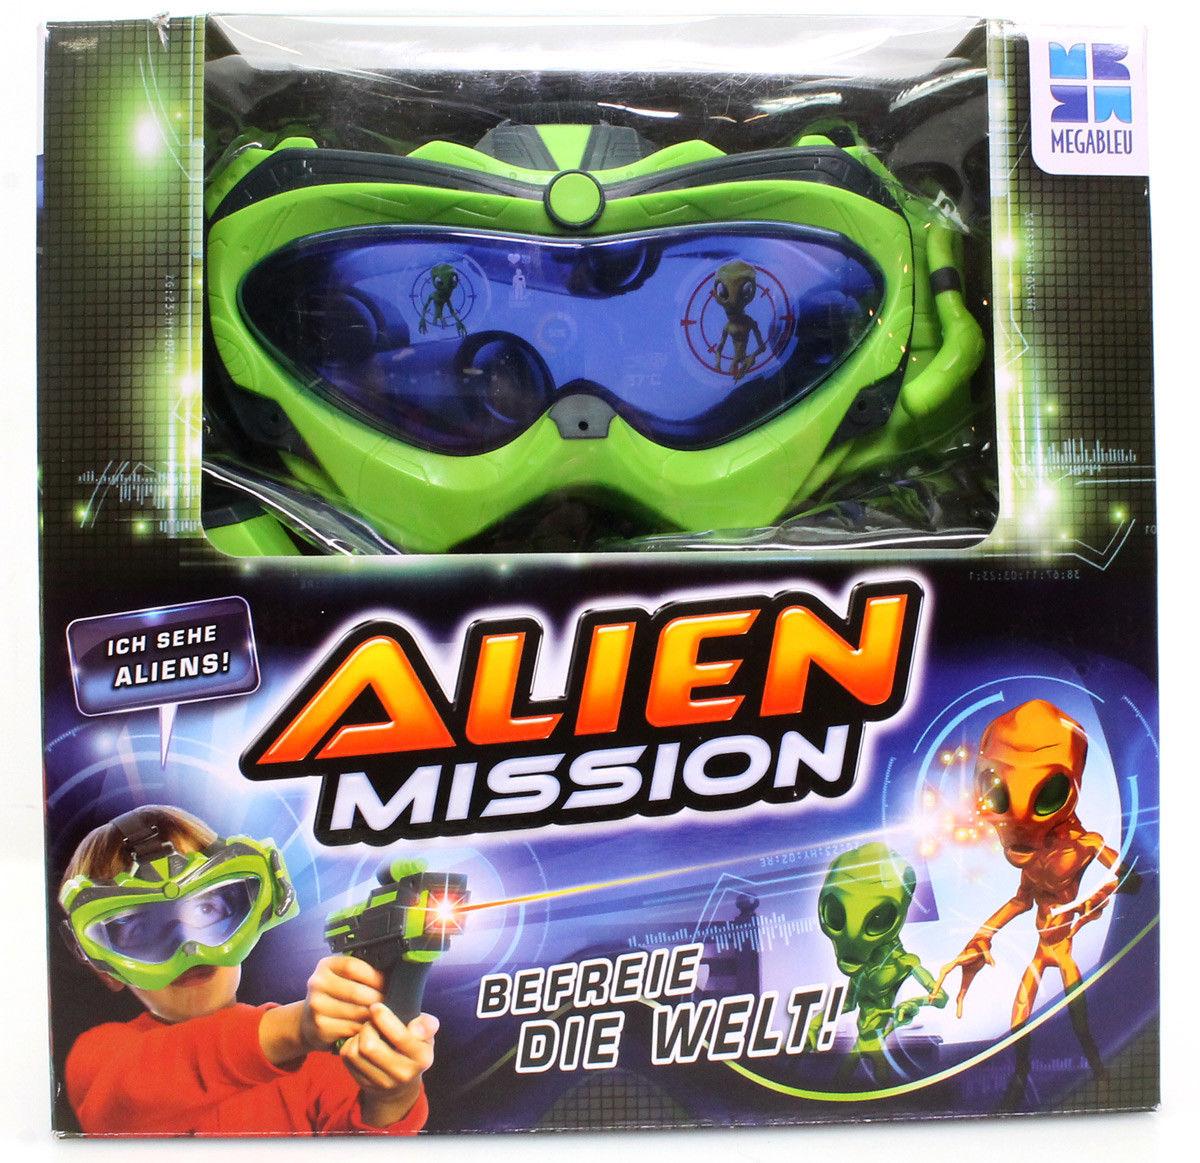 Alien Mission von Megableu Aktionspiel 678465 Vision Brille, Shooter Laserkanone